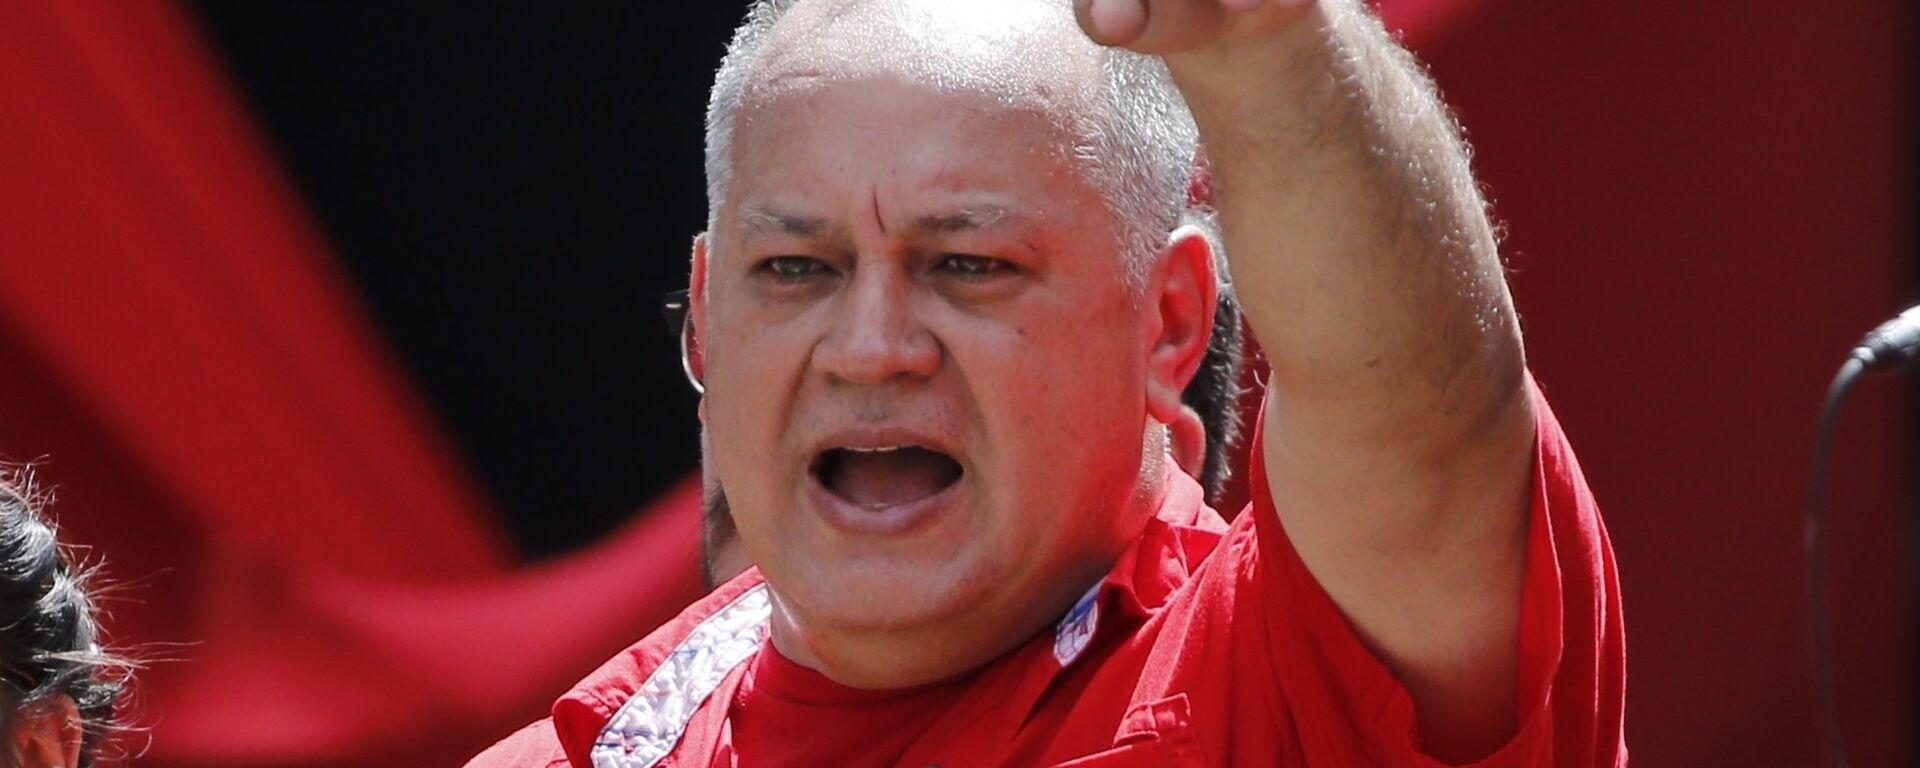 Diosdado Cabello, presidente de la Asamblea Nacional Constituyente de Venezuela - Sputnik Mundo, 1920, 28.01.2021